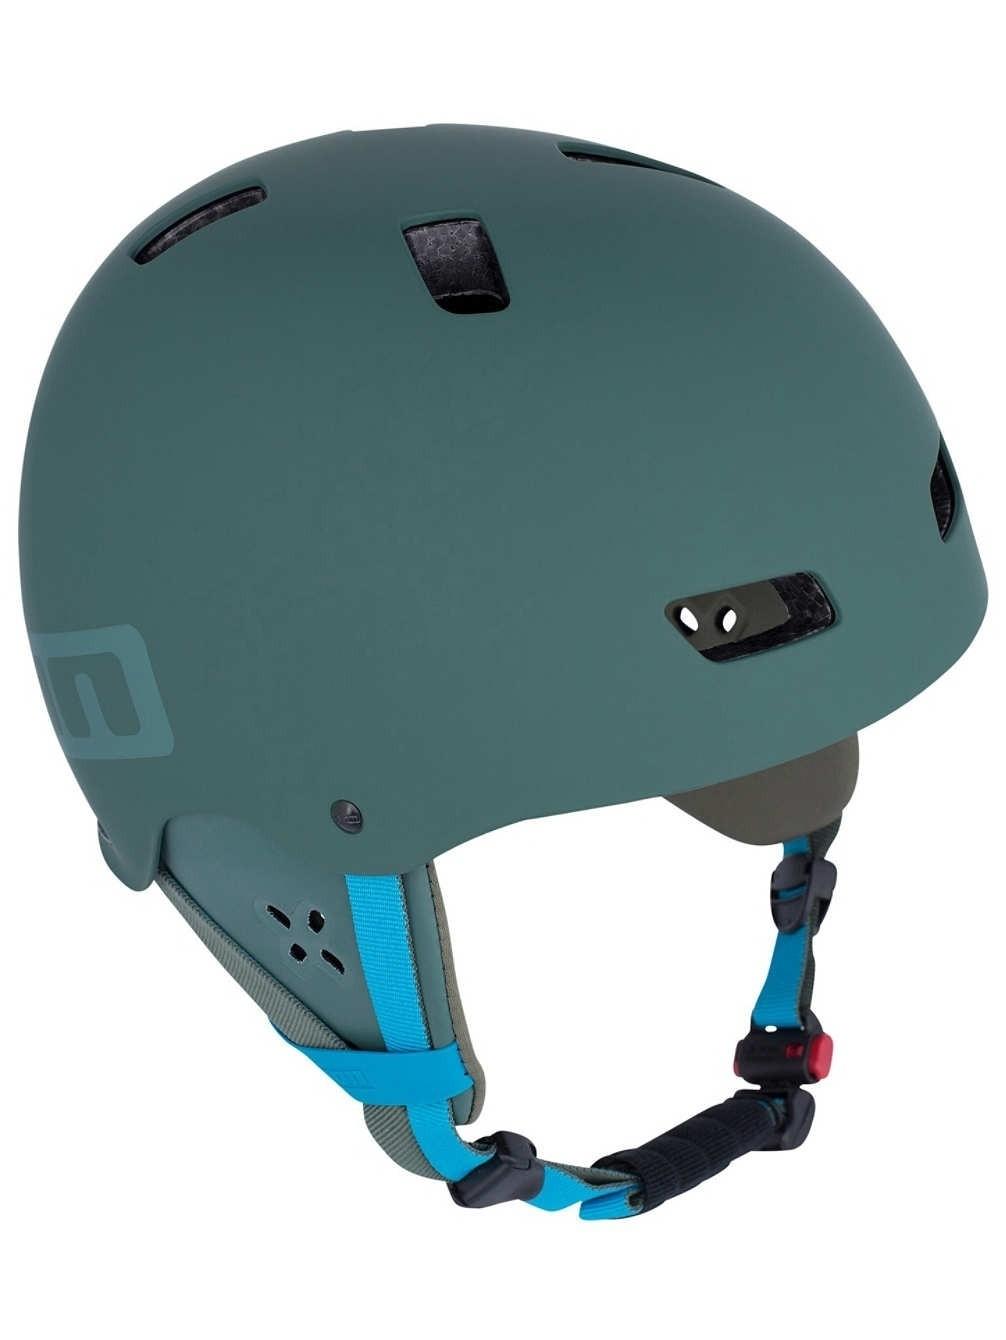 Ion Surf helm Hardcap 3.1 Comfort